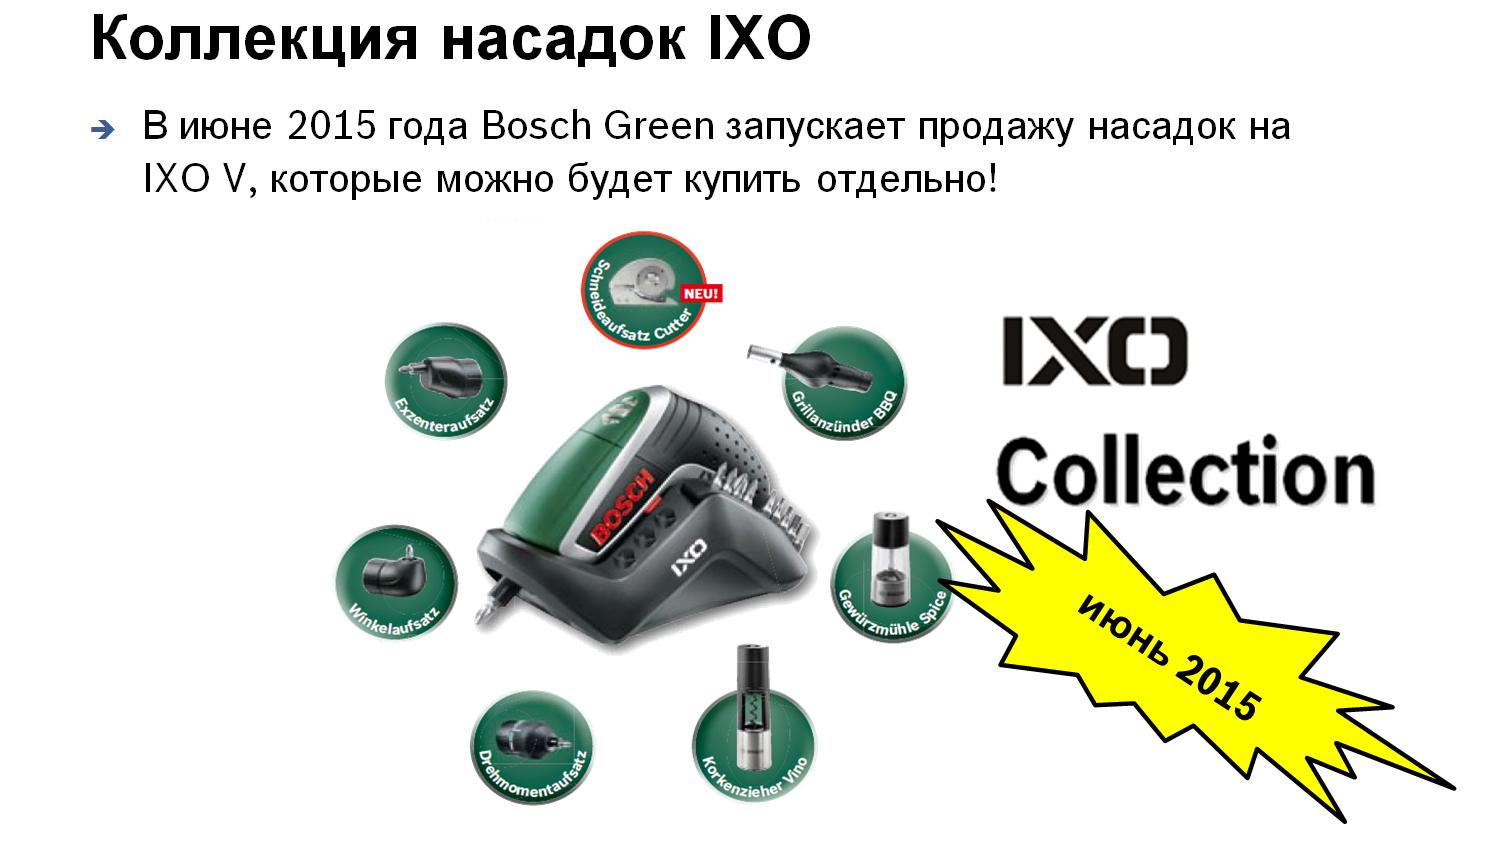 Коллекция насадок IXO